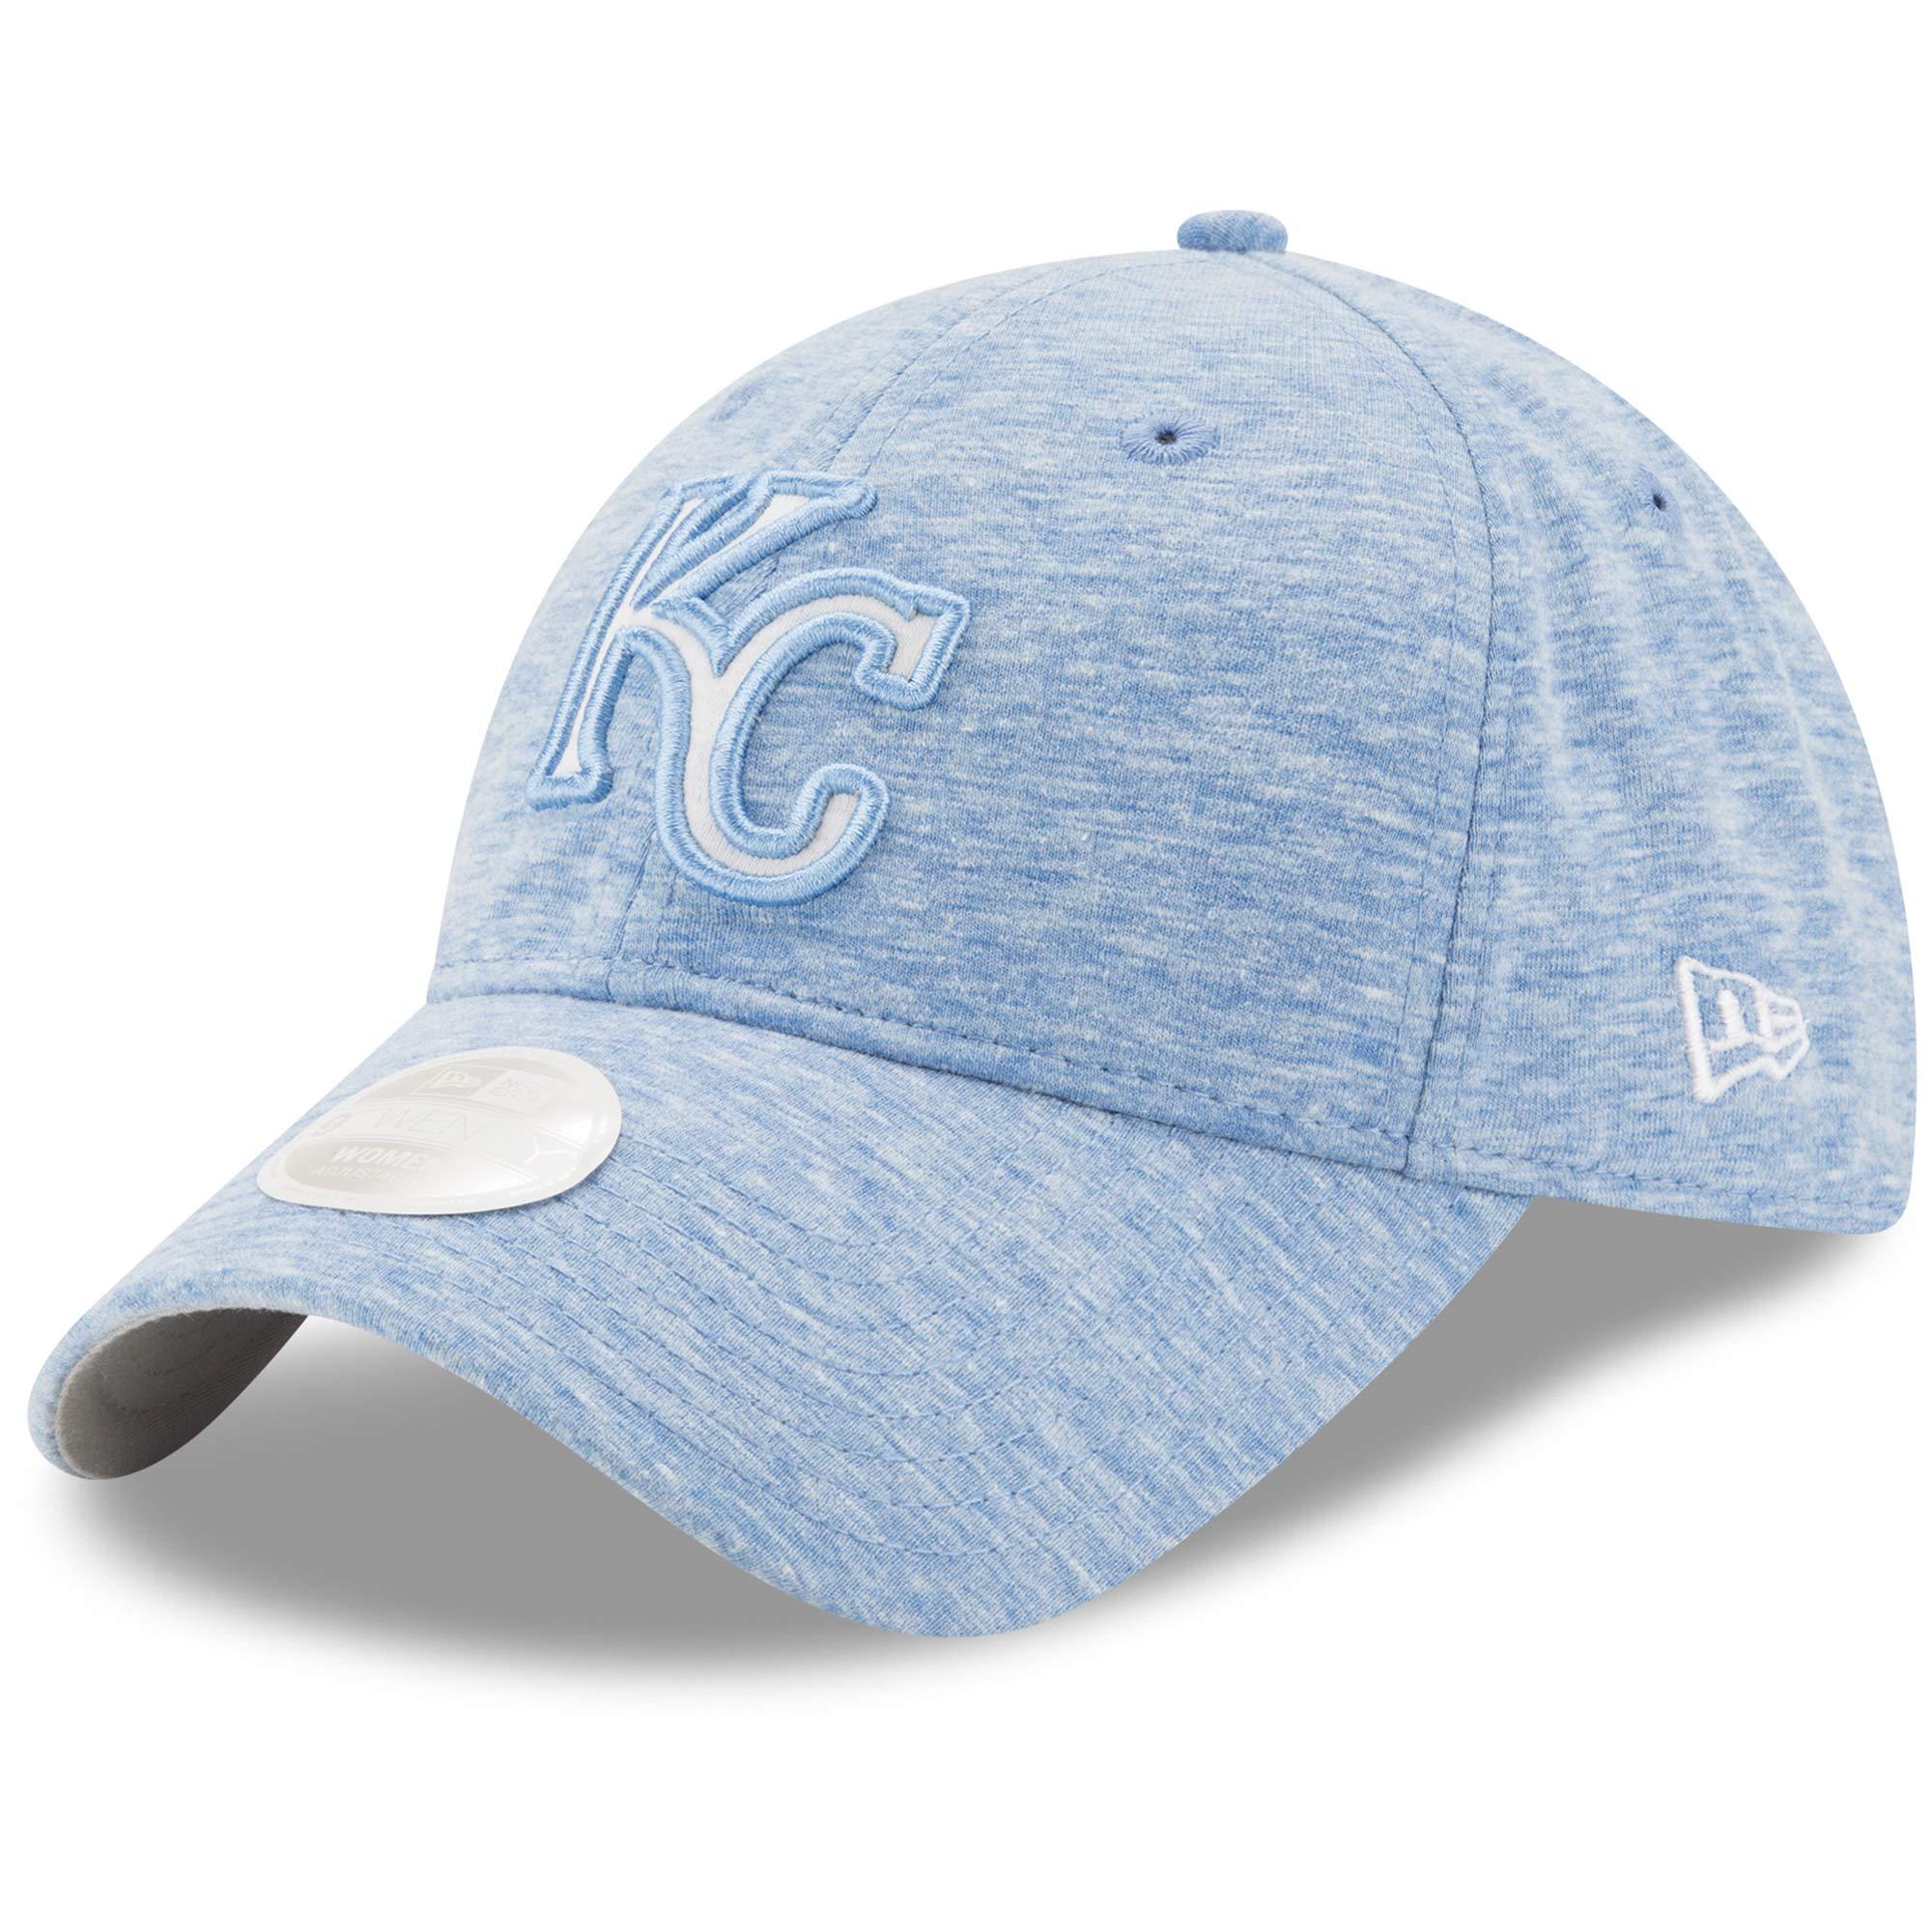 buy popular a68af a027d ... buy kansas city royals new era womens team multi tone 9twenty  adjustable hat royal osfa b6850